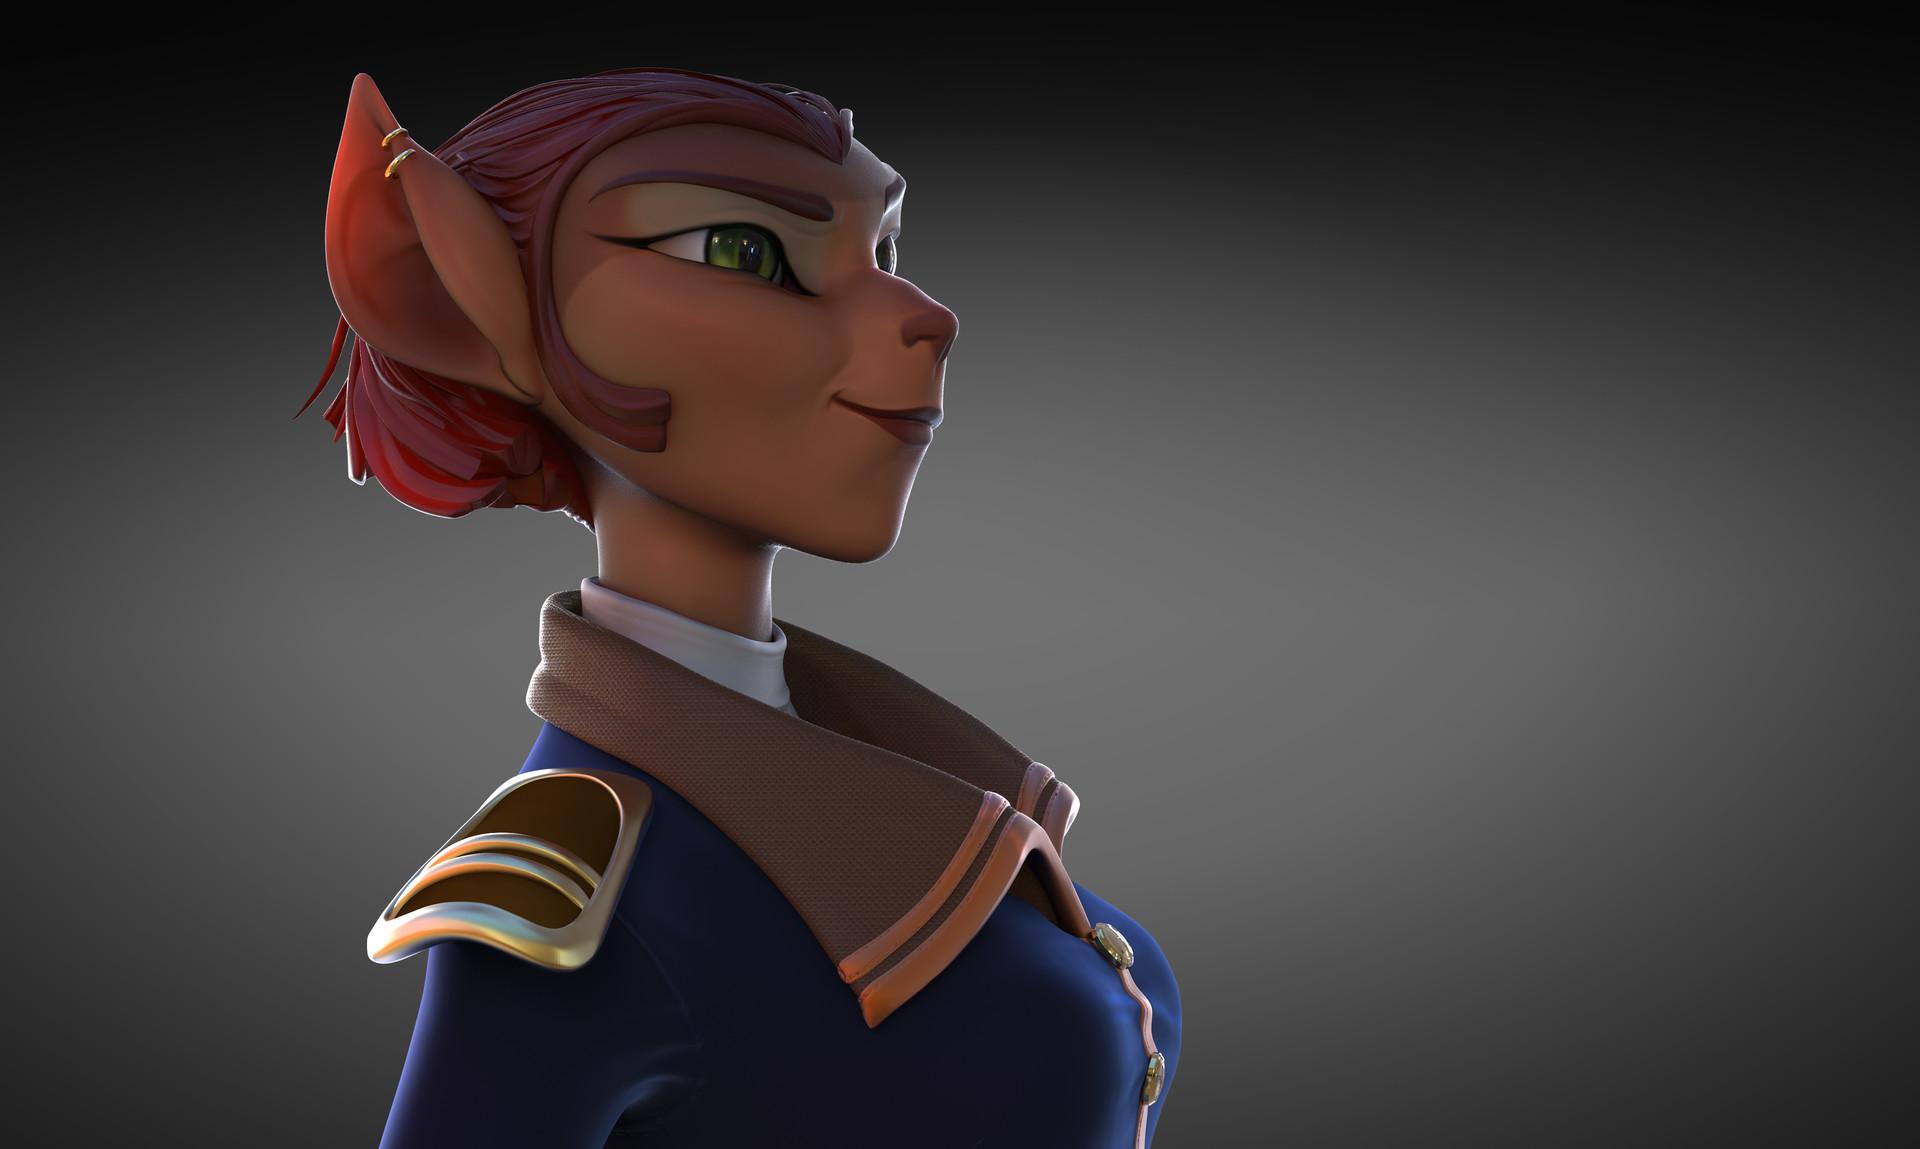 treasure planet captain amelia - HD1920×1149